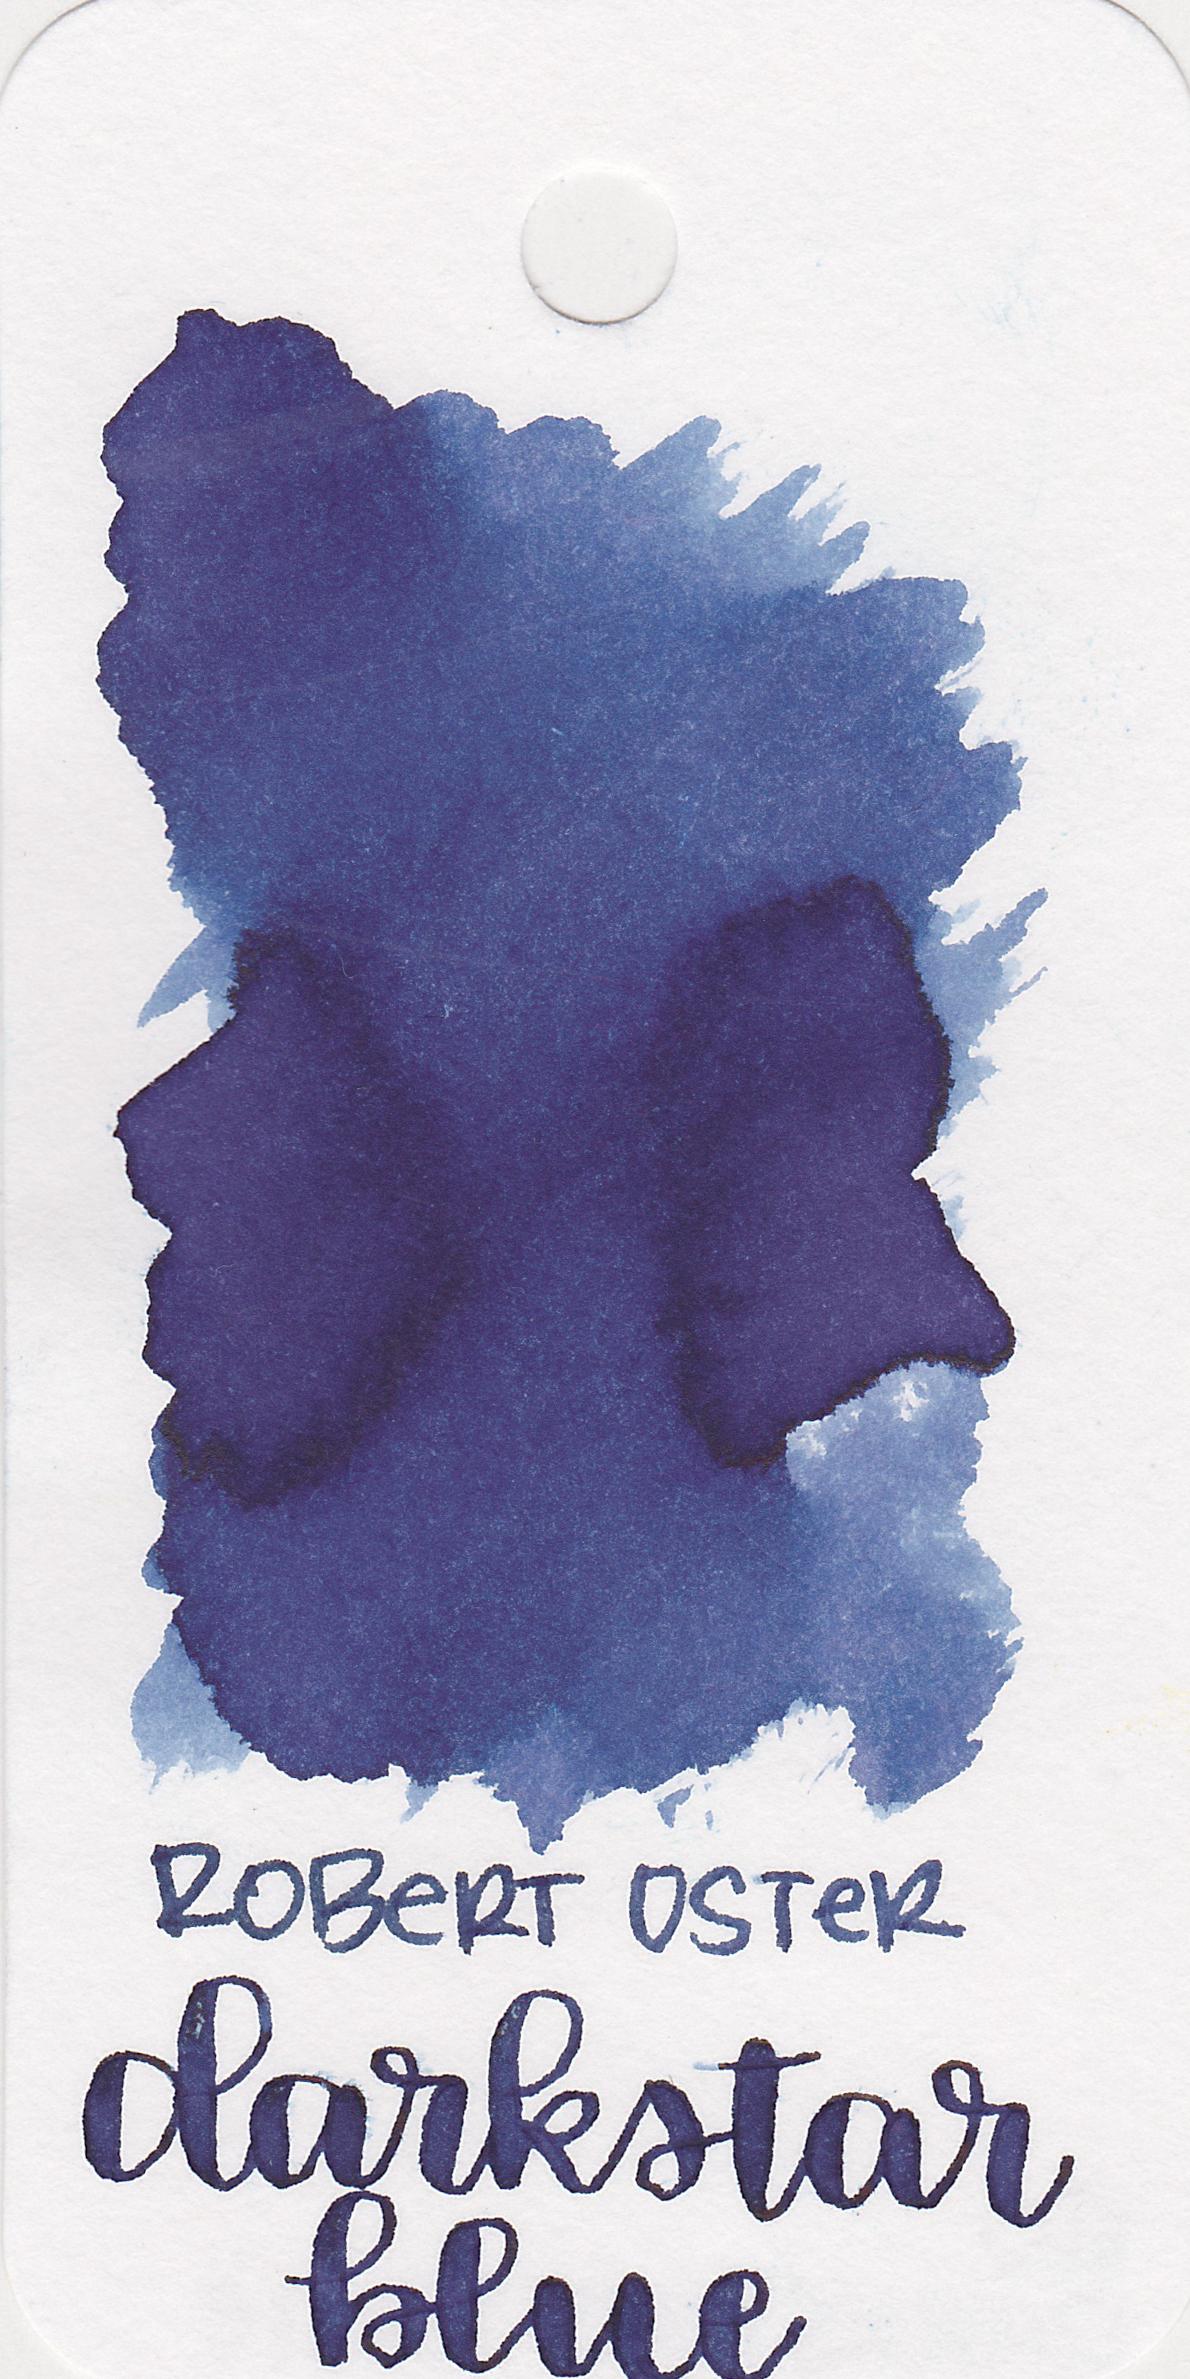 The color: - Darkstar Blue is a beautiful dark blue with a purple undertone.